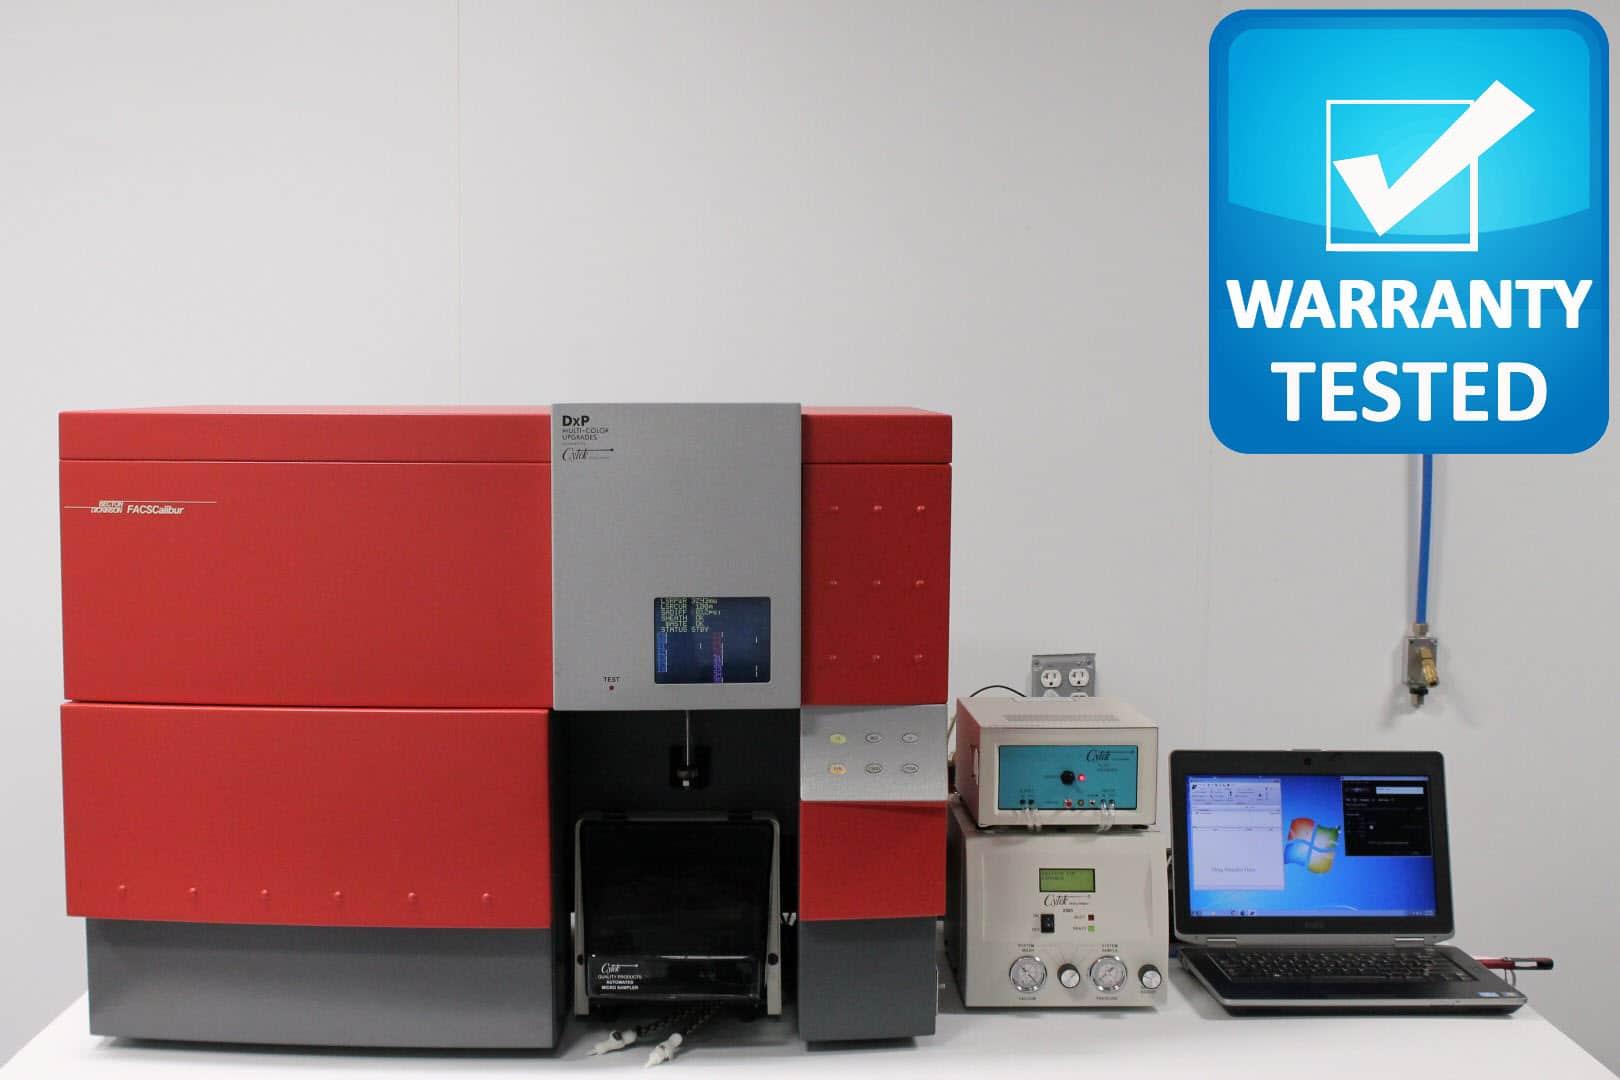 BD FACSCalibur Flow Cytometer w/ Cytek DxP Multi-Color Upgrade 3 Laser/10 Color